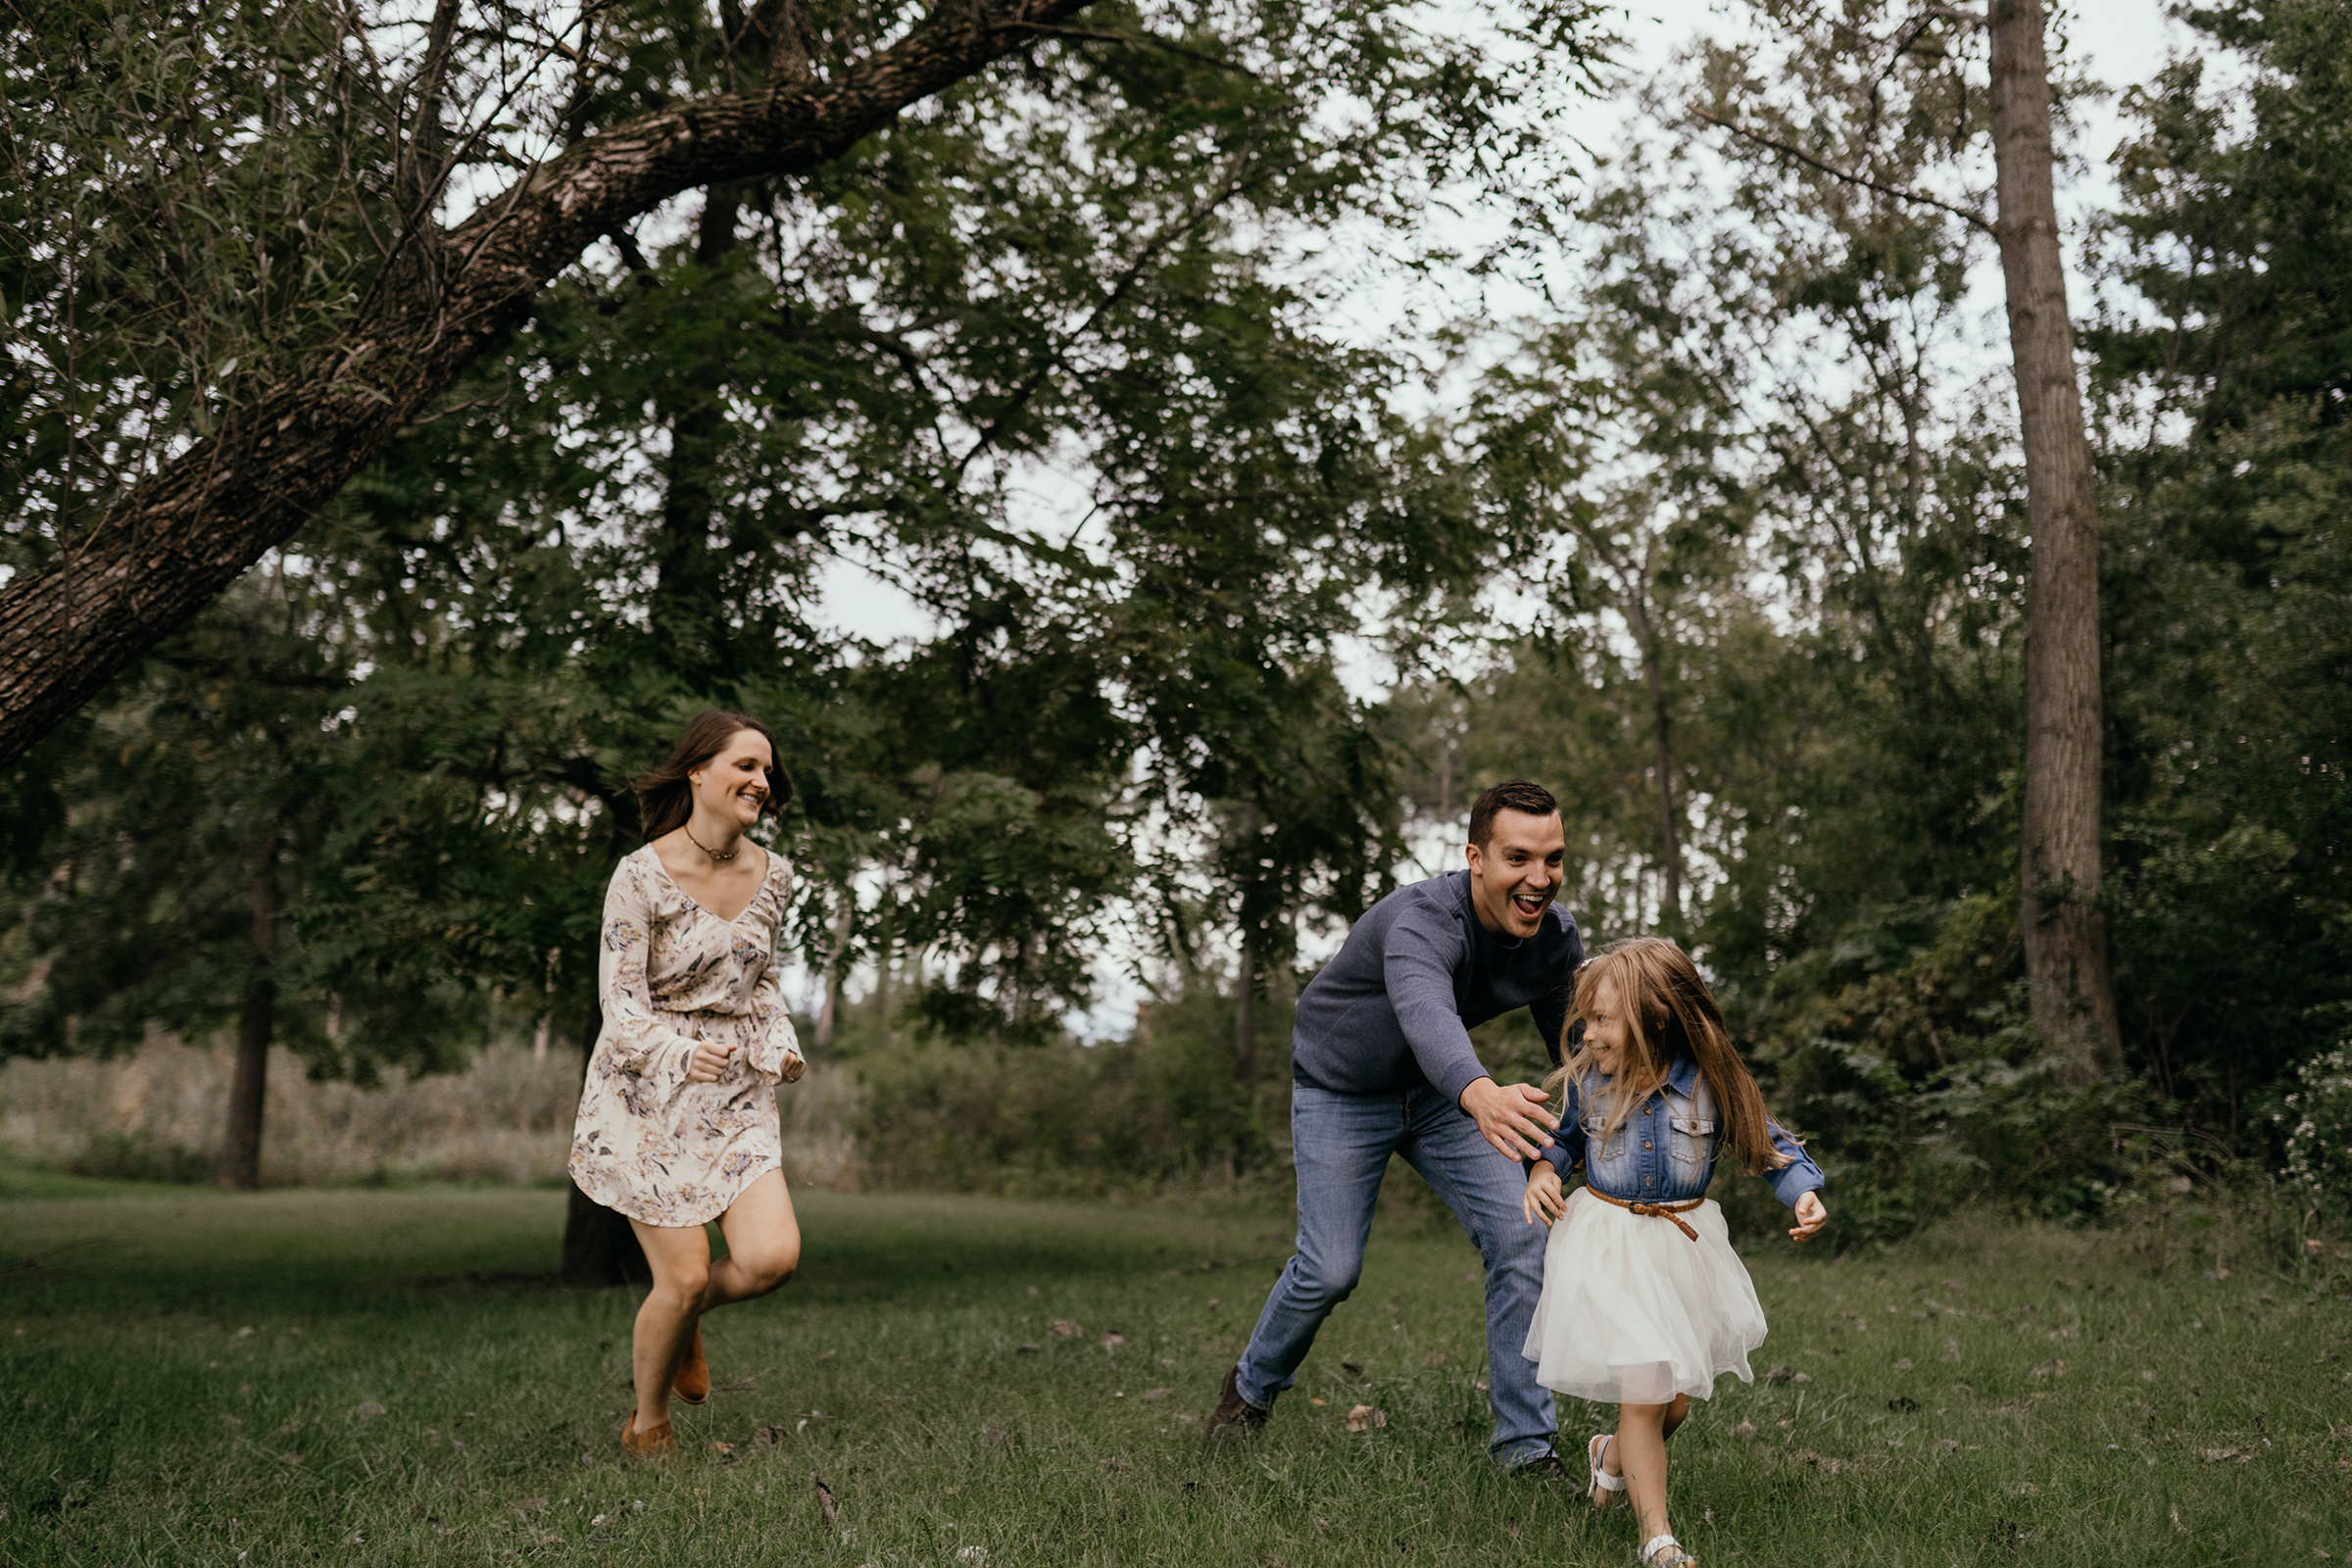 mueller-family-mom-dad-chasing-kid-granger-iowa-raelyn-ramey-photography.jpg